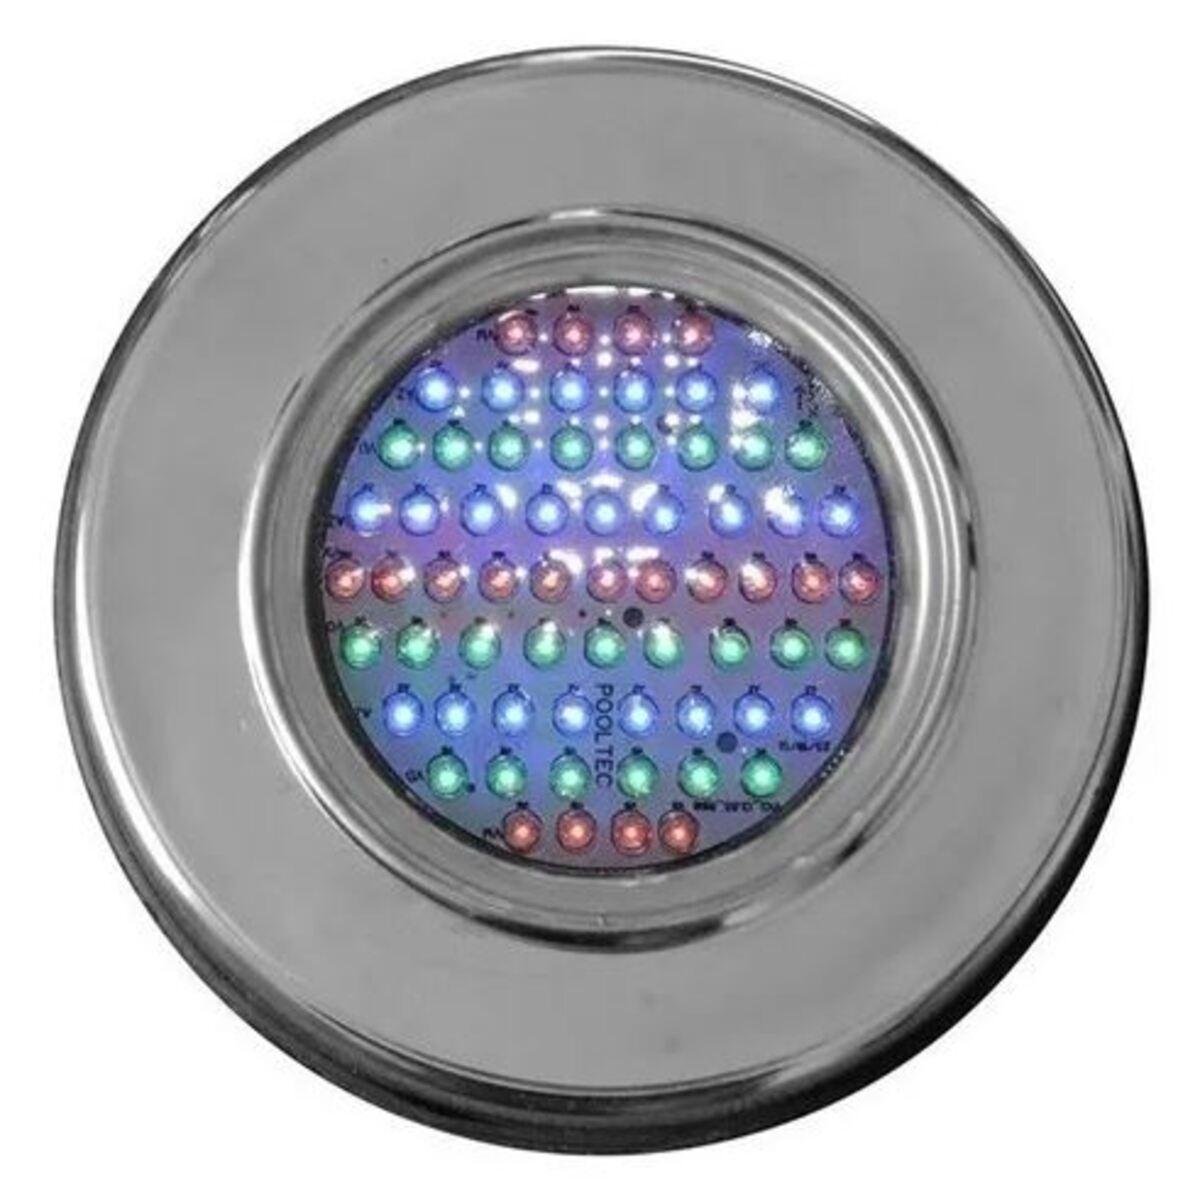 "Refletor RGB Steel Led 65 Inox com Plug 1/2"" Pooltec"